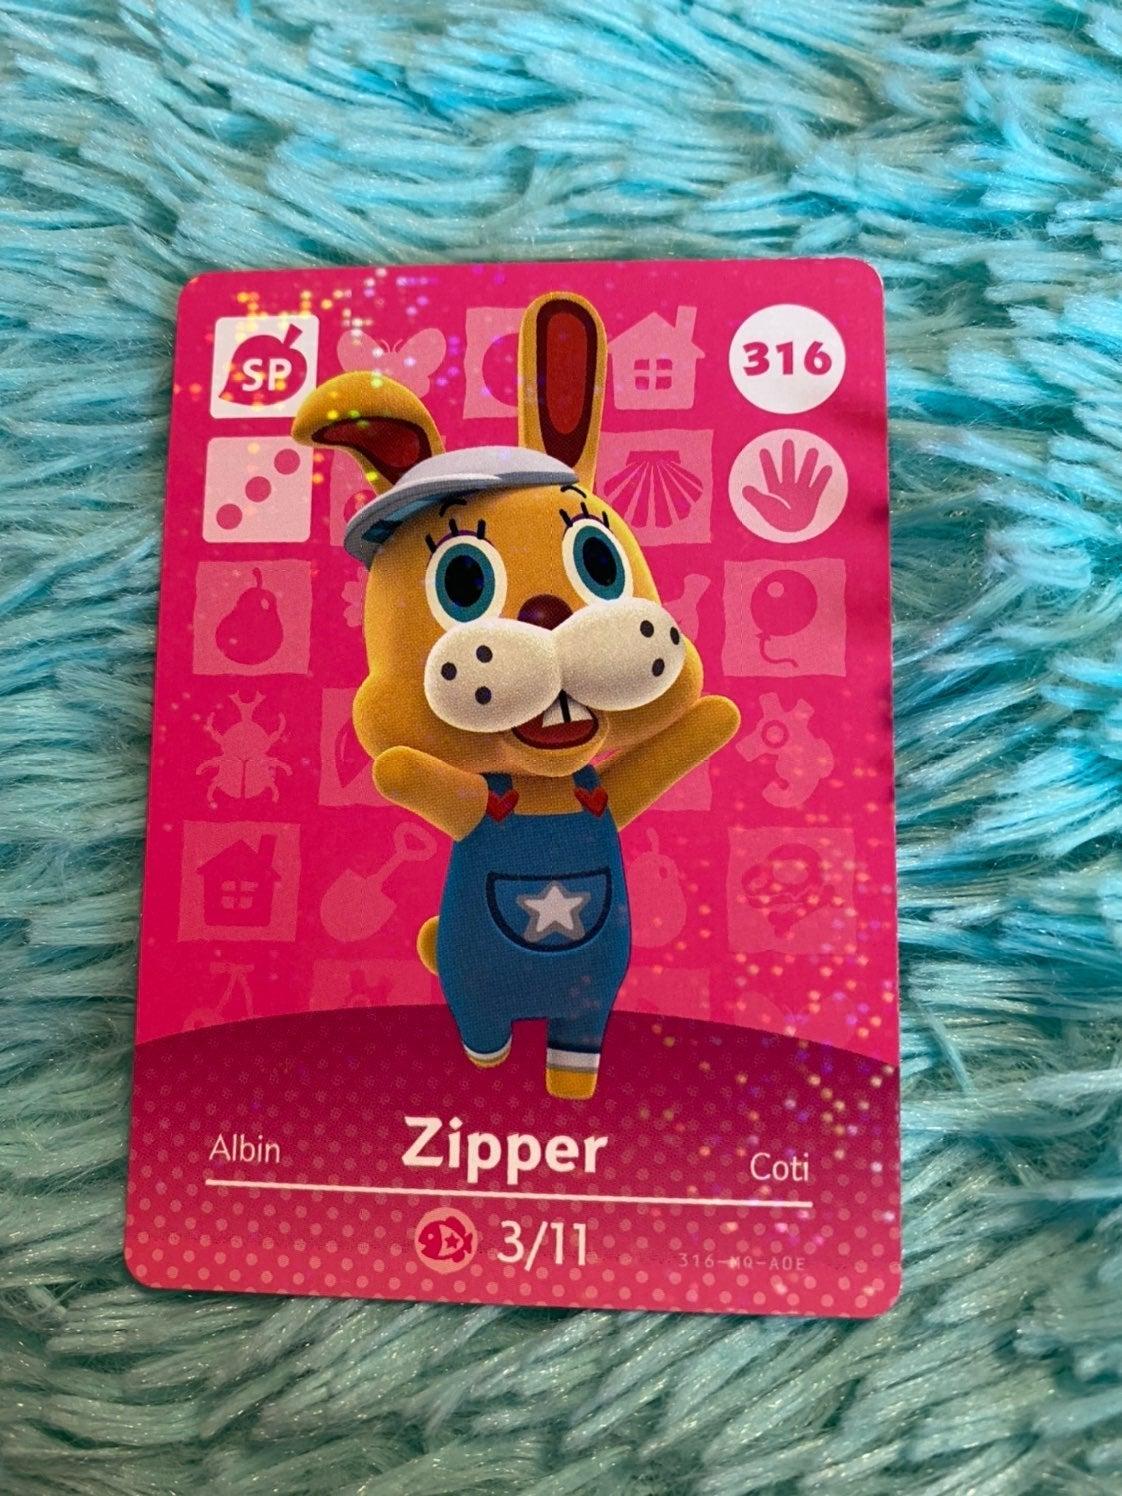 Zipper - Animal Crossing Amiibo Card